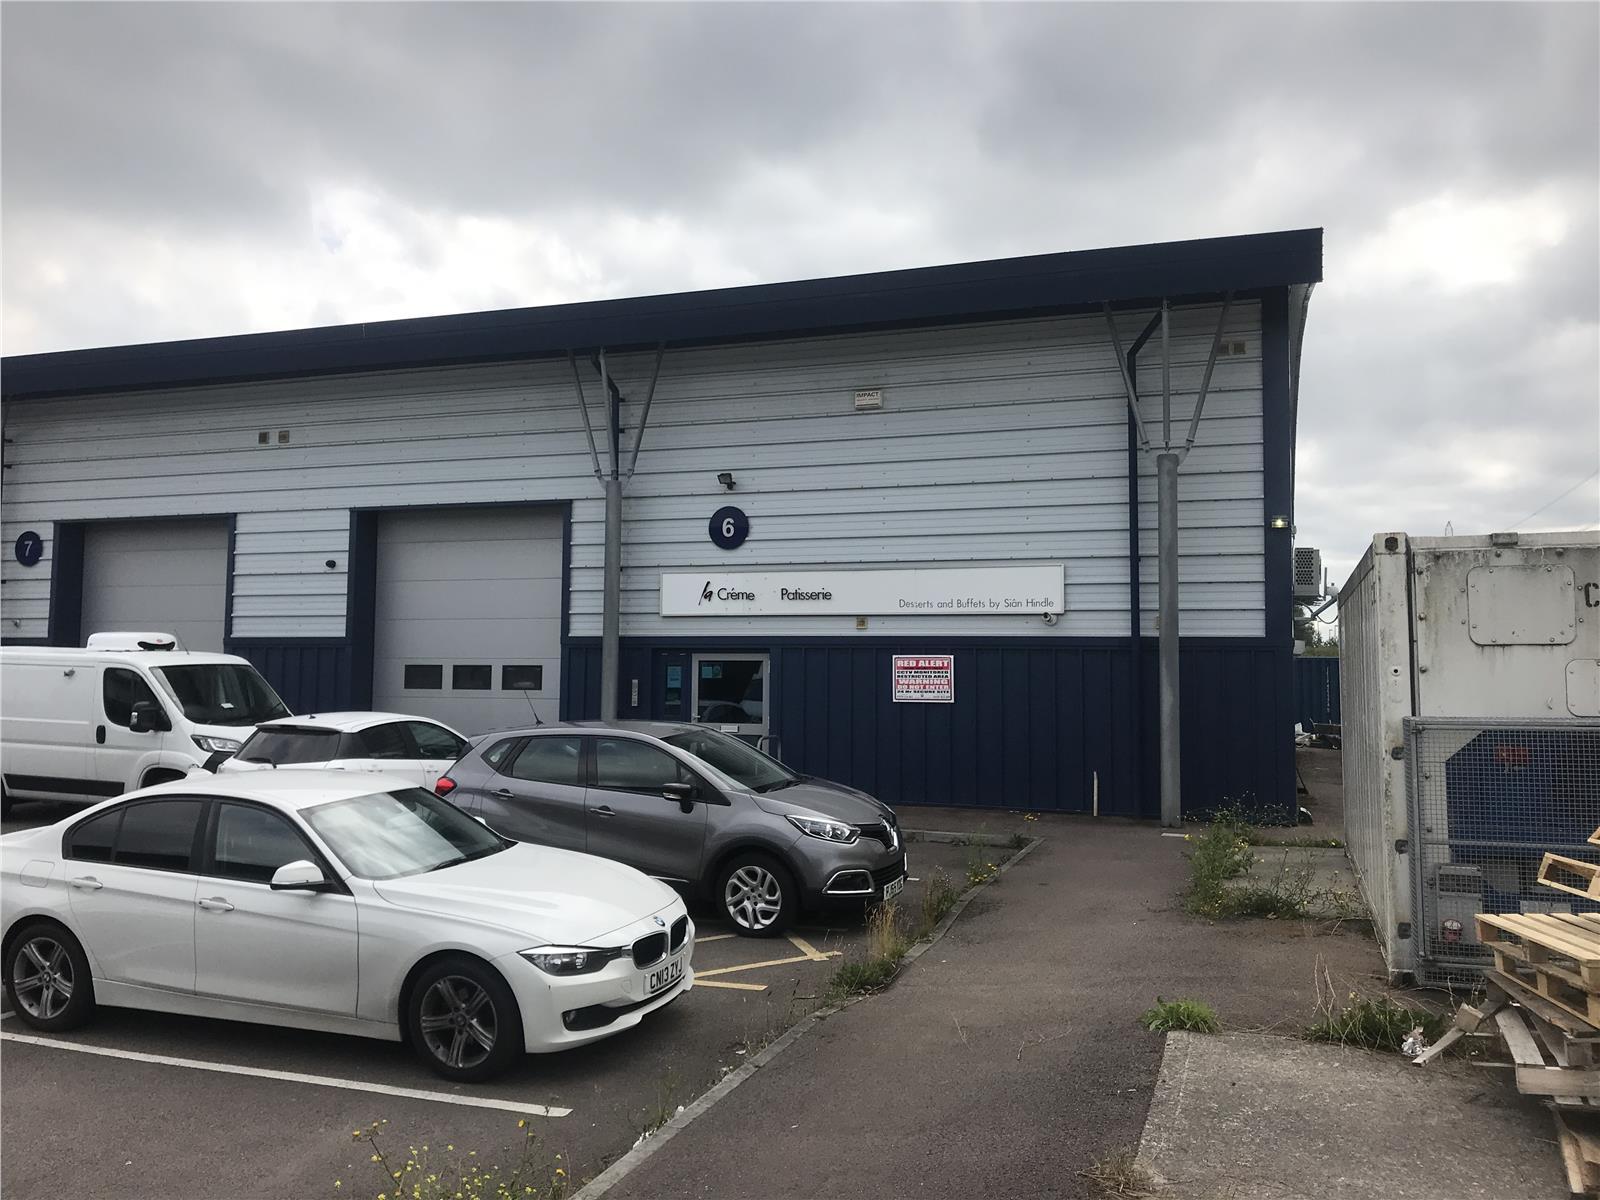 Unit 6 Mardon Park, Off Central Avenue, Baglan, Port Talbot, Neath Port Talbot, SA12